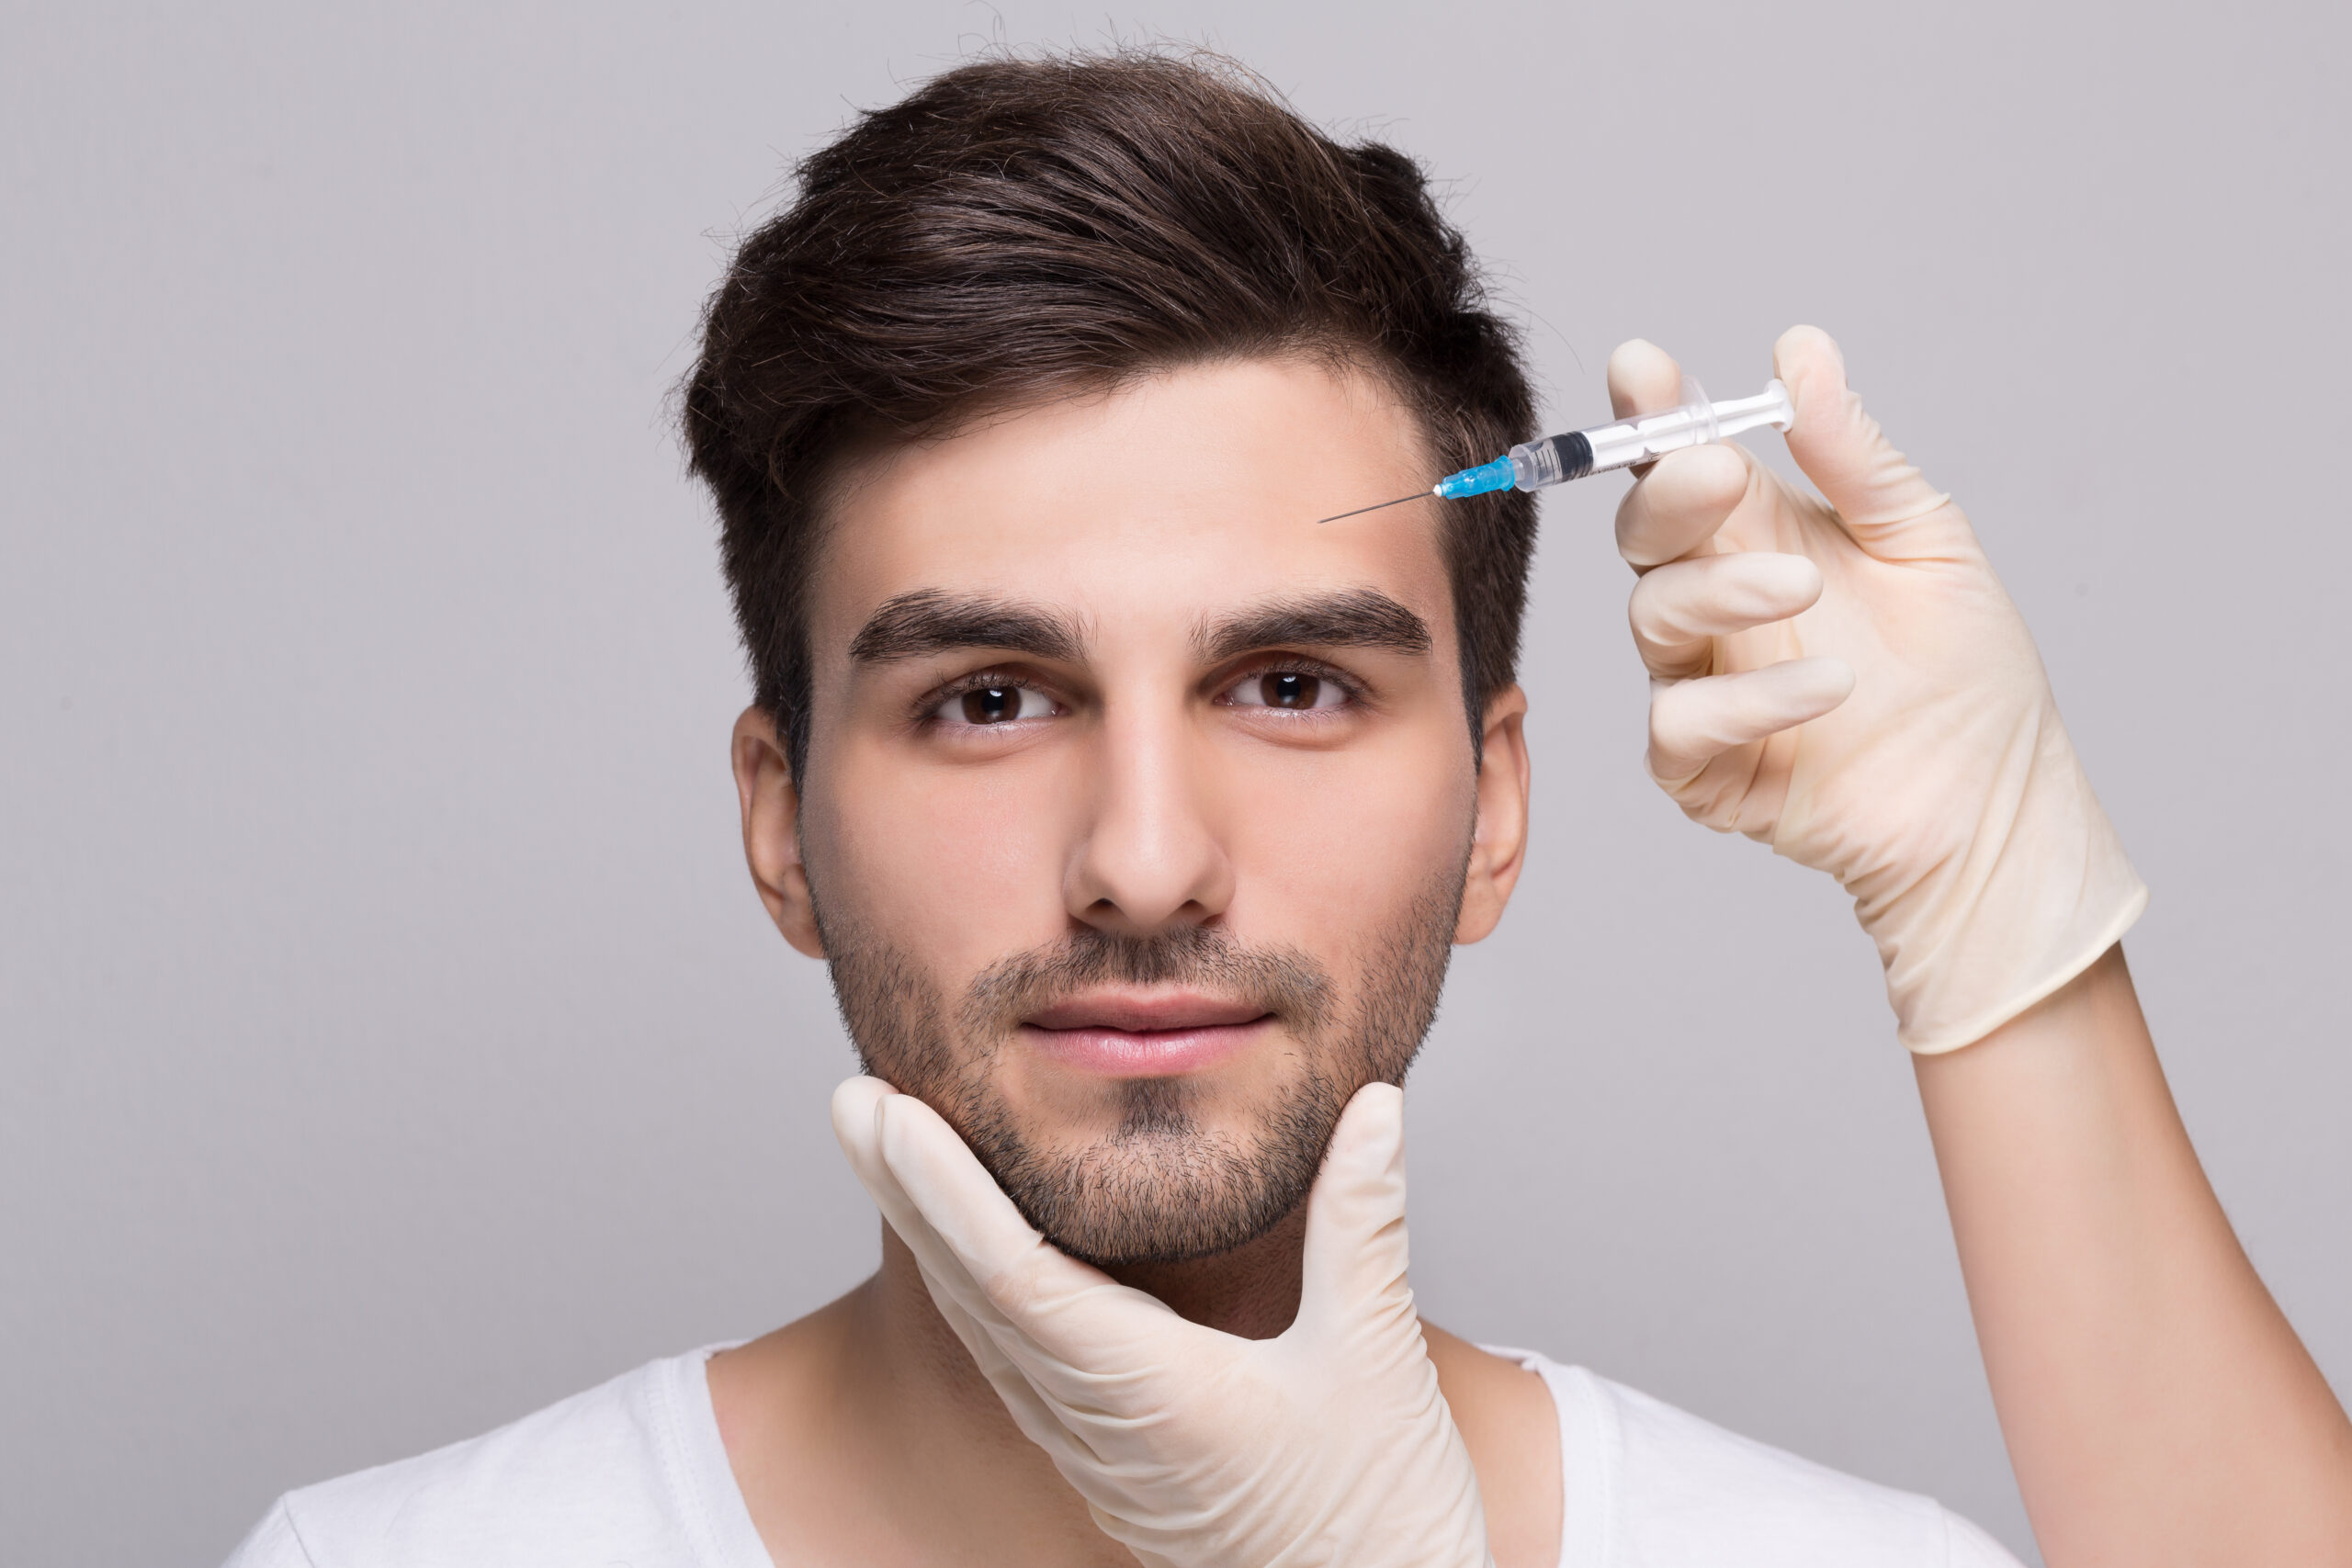 Man receiving botox injections